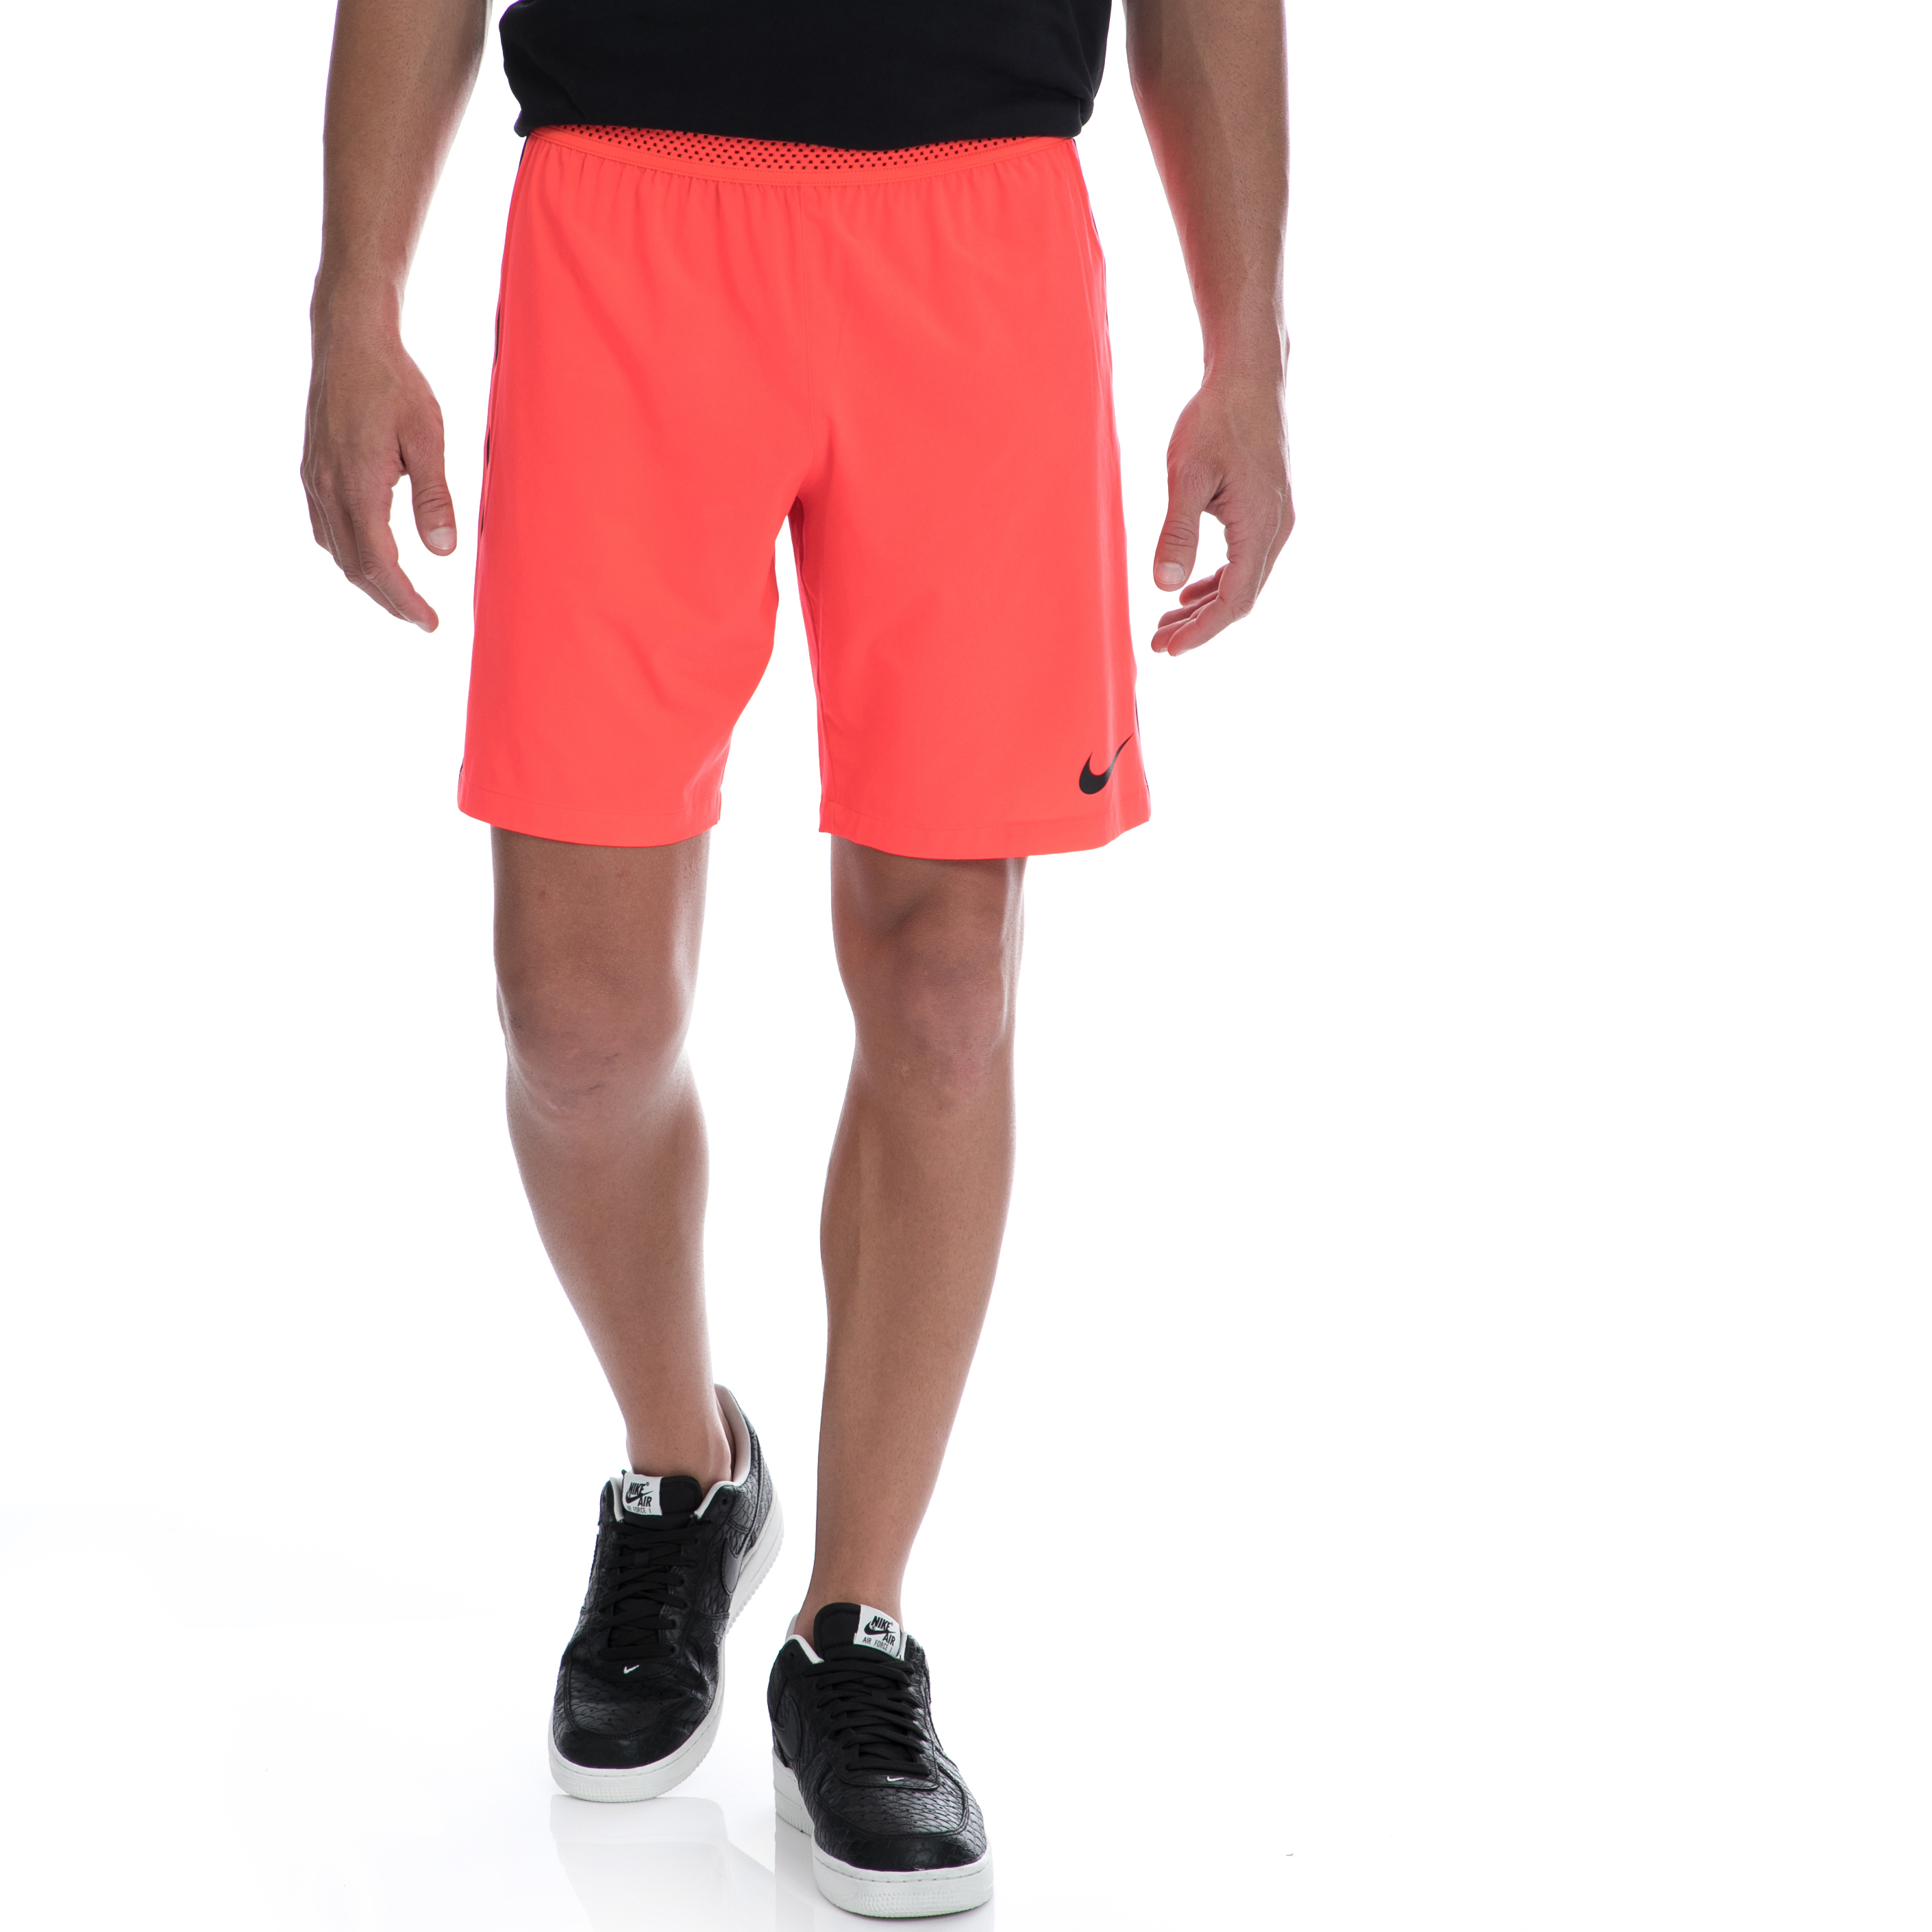 NIKE - Αντρικό σορτς NIKE κόκκινο ανδρικά ρούχα σορτς βερμούδες αθλητικά